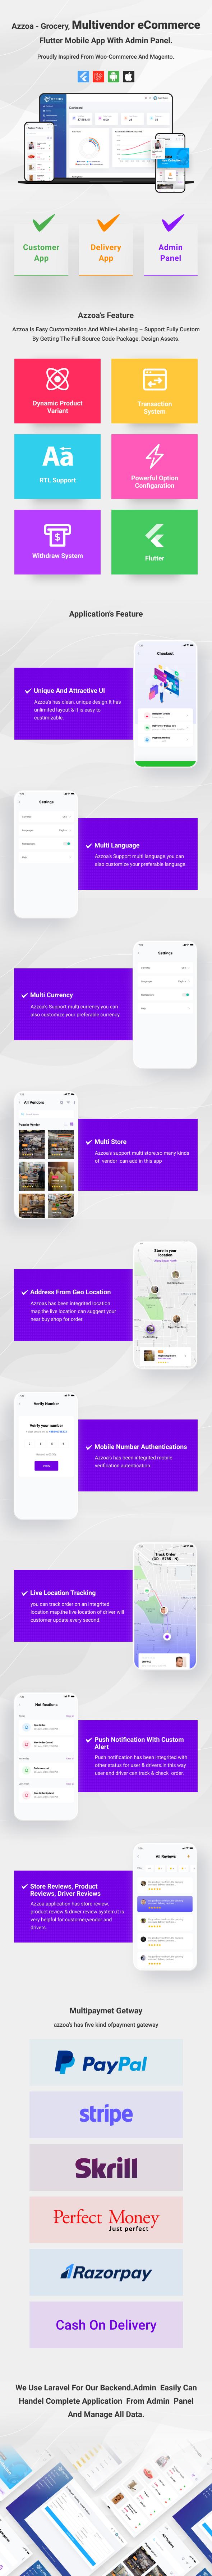 azzoa grocery, eCommerce mobile app